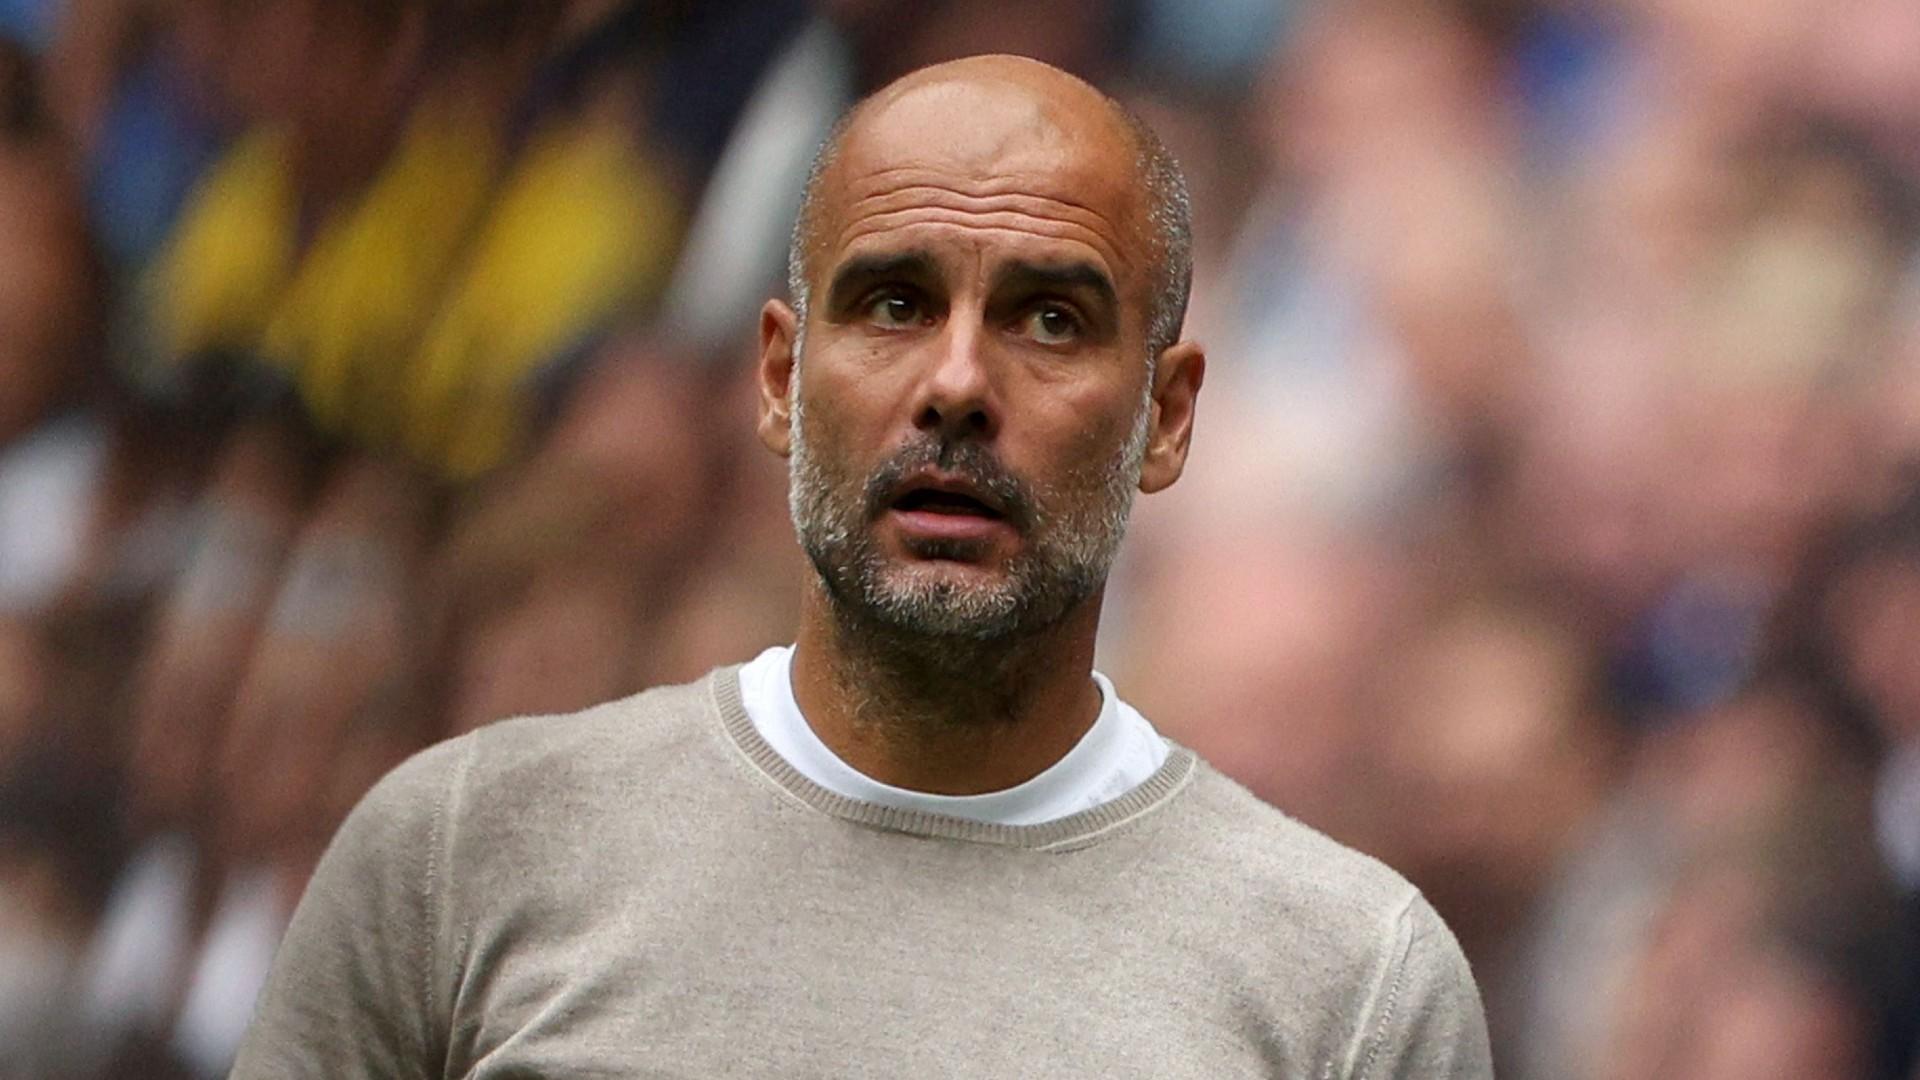 Guardiola 'more than optimistic' about Man City fortunes despite rocky start against Spurs